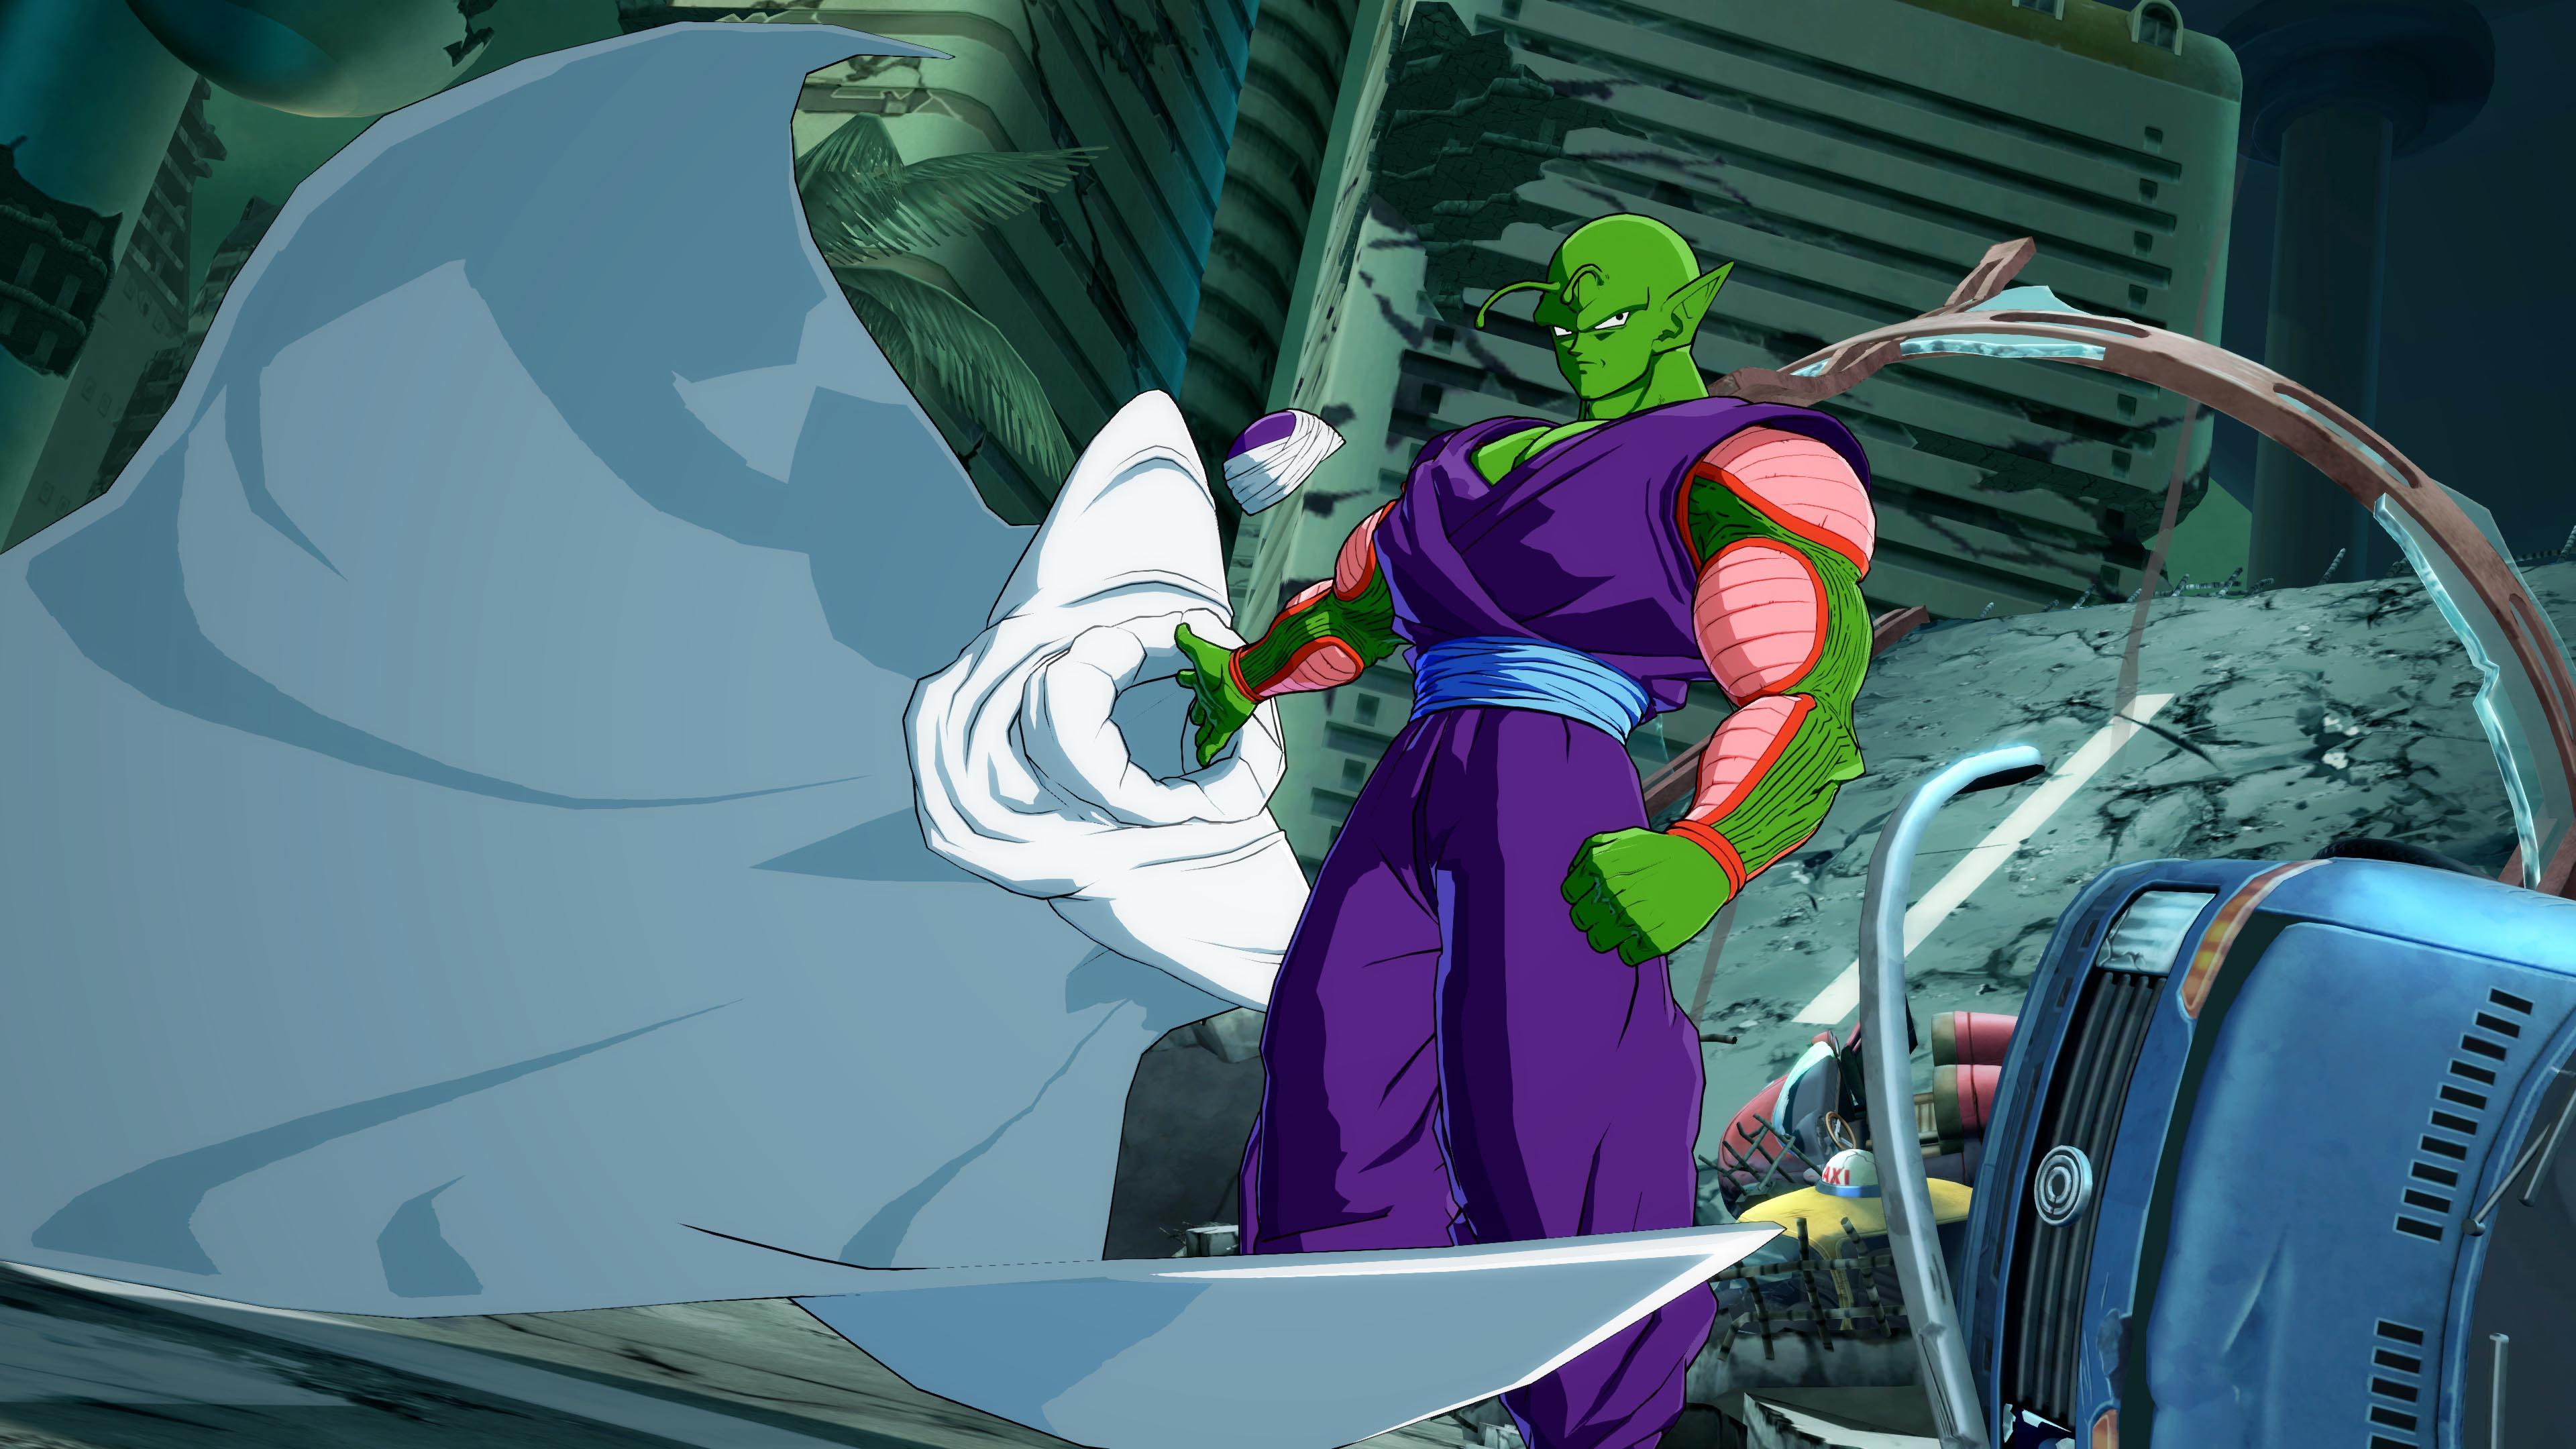 DRAGON BALL FIGHTERZ pose guerrero